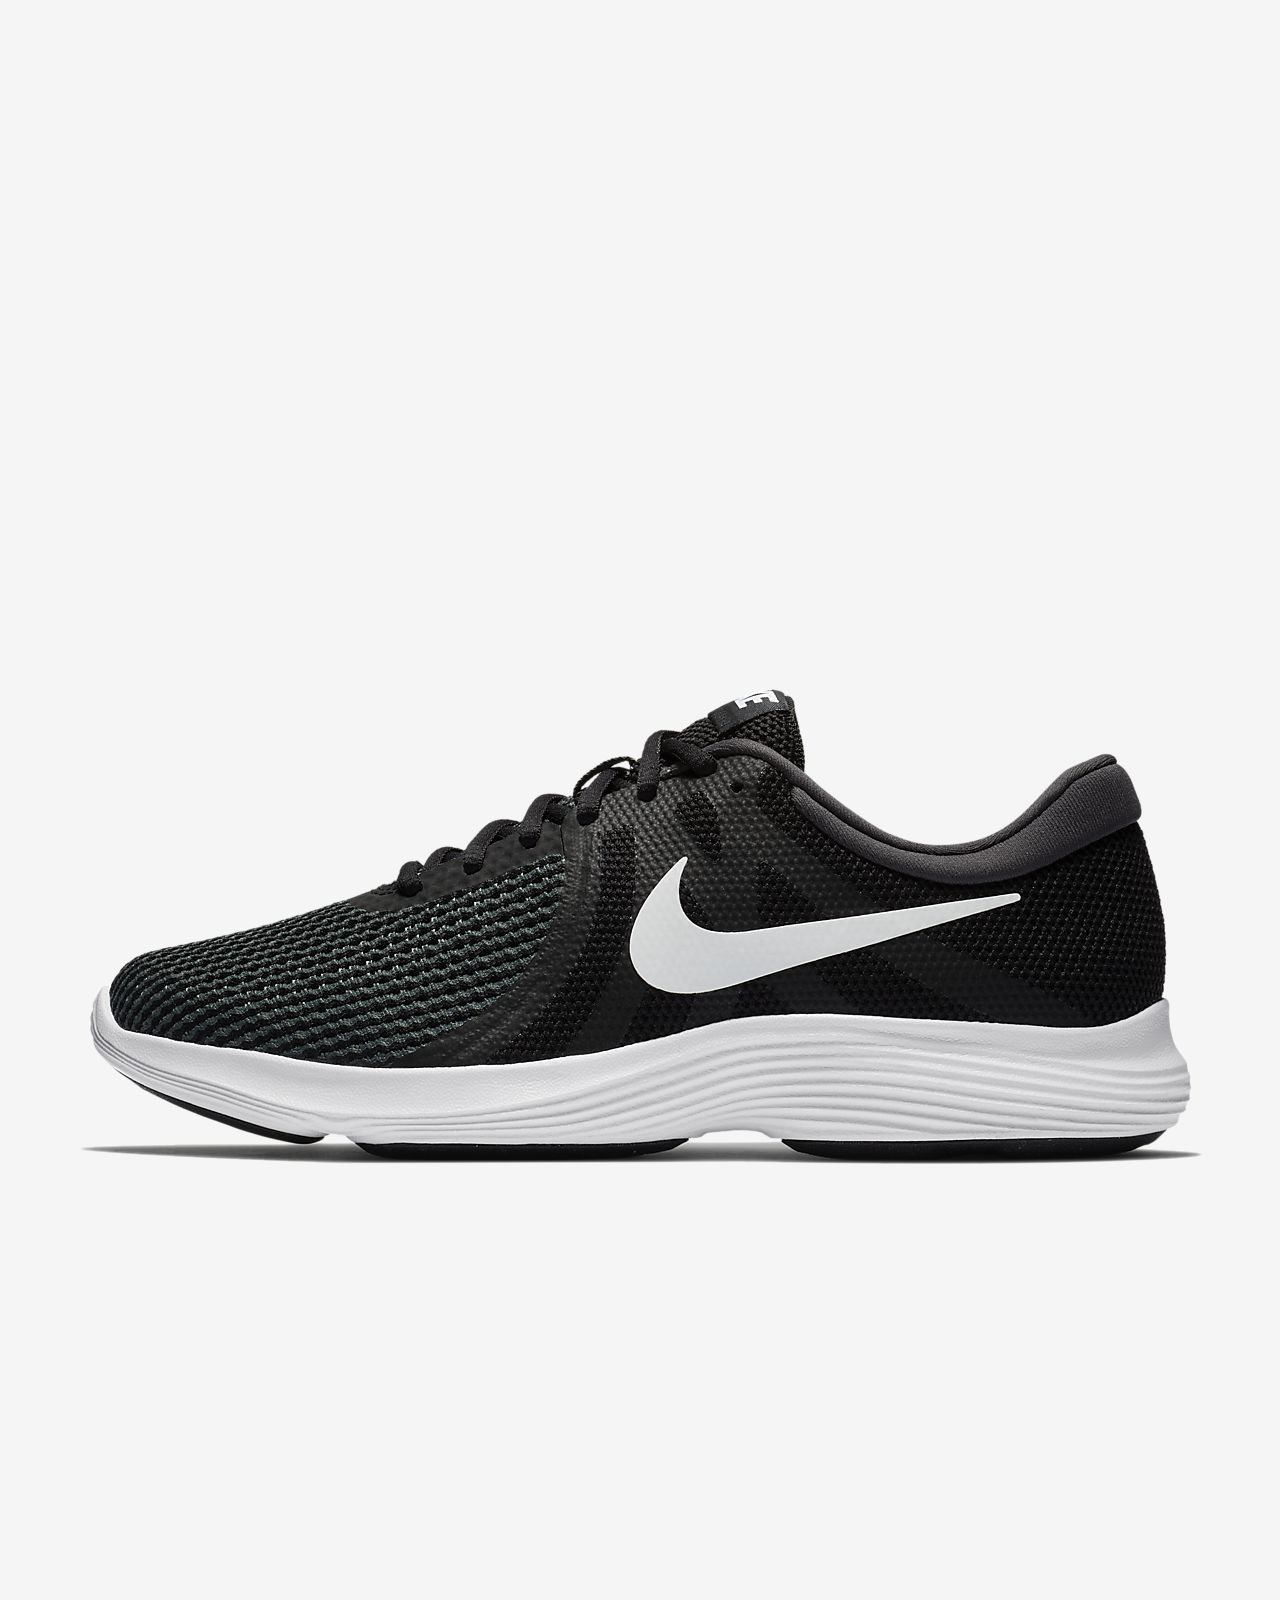 meet 63e37 08b7c Nike Revolution 4 EU Zapatillas de running - Mujer. Nike.com ES